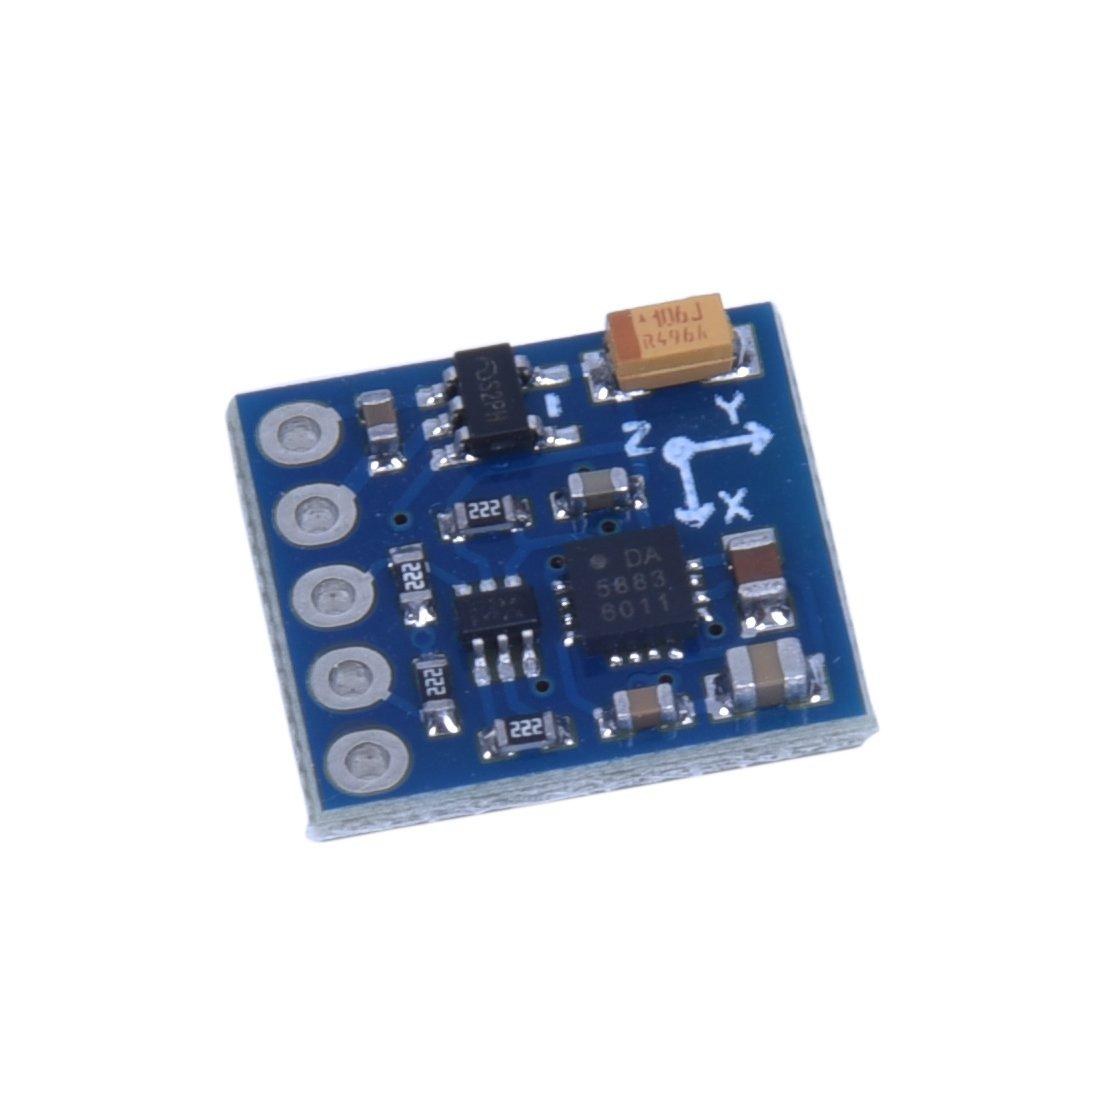 TOOGOO(R) HMC5883L Power supply:3V-5V Triple Axis Compass Magnetometer Sensor Module by TOOGOO(R) (Image #3)